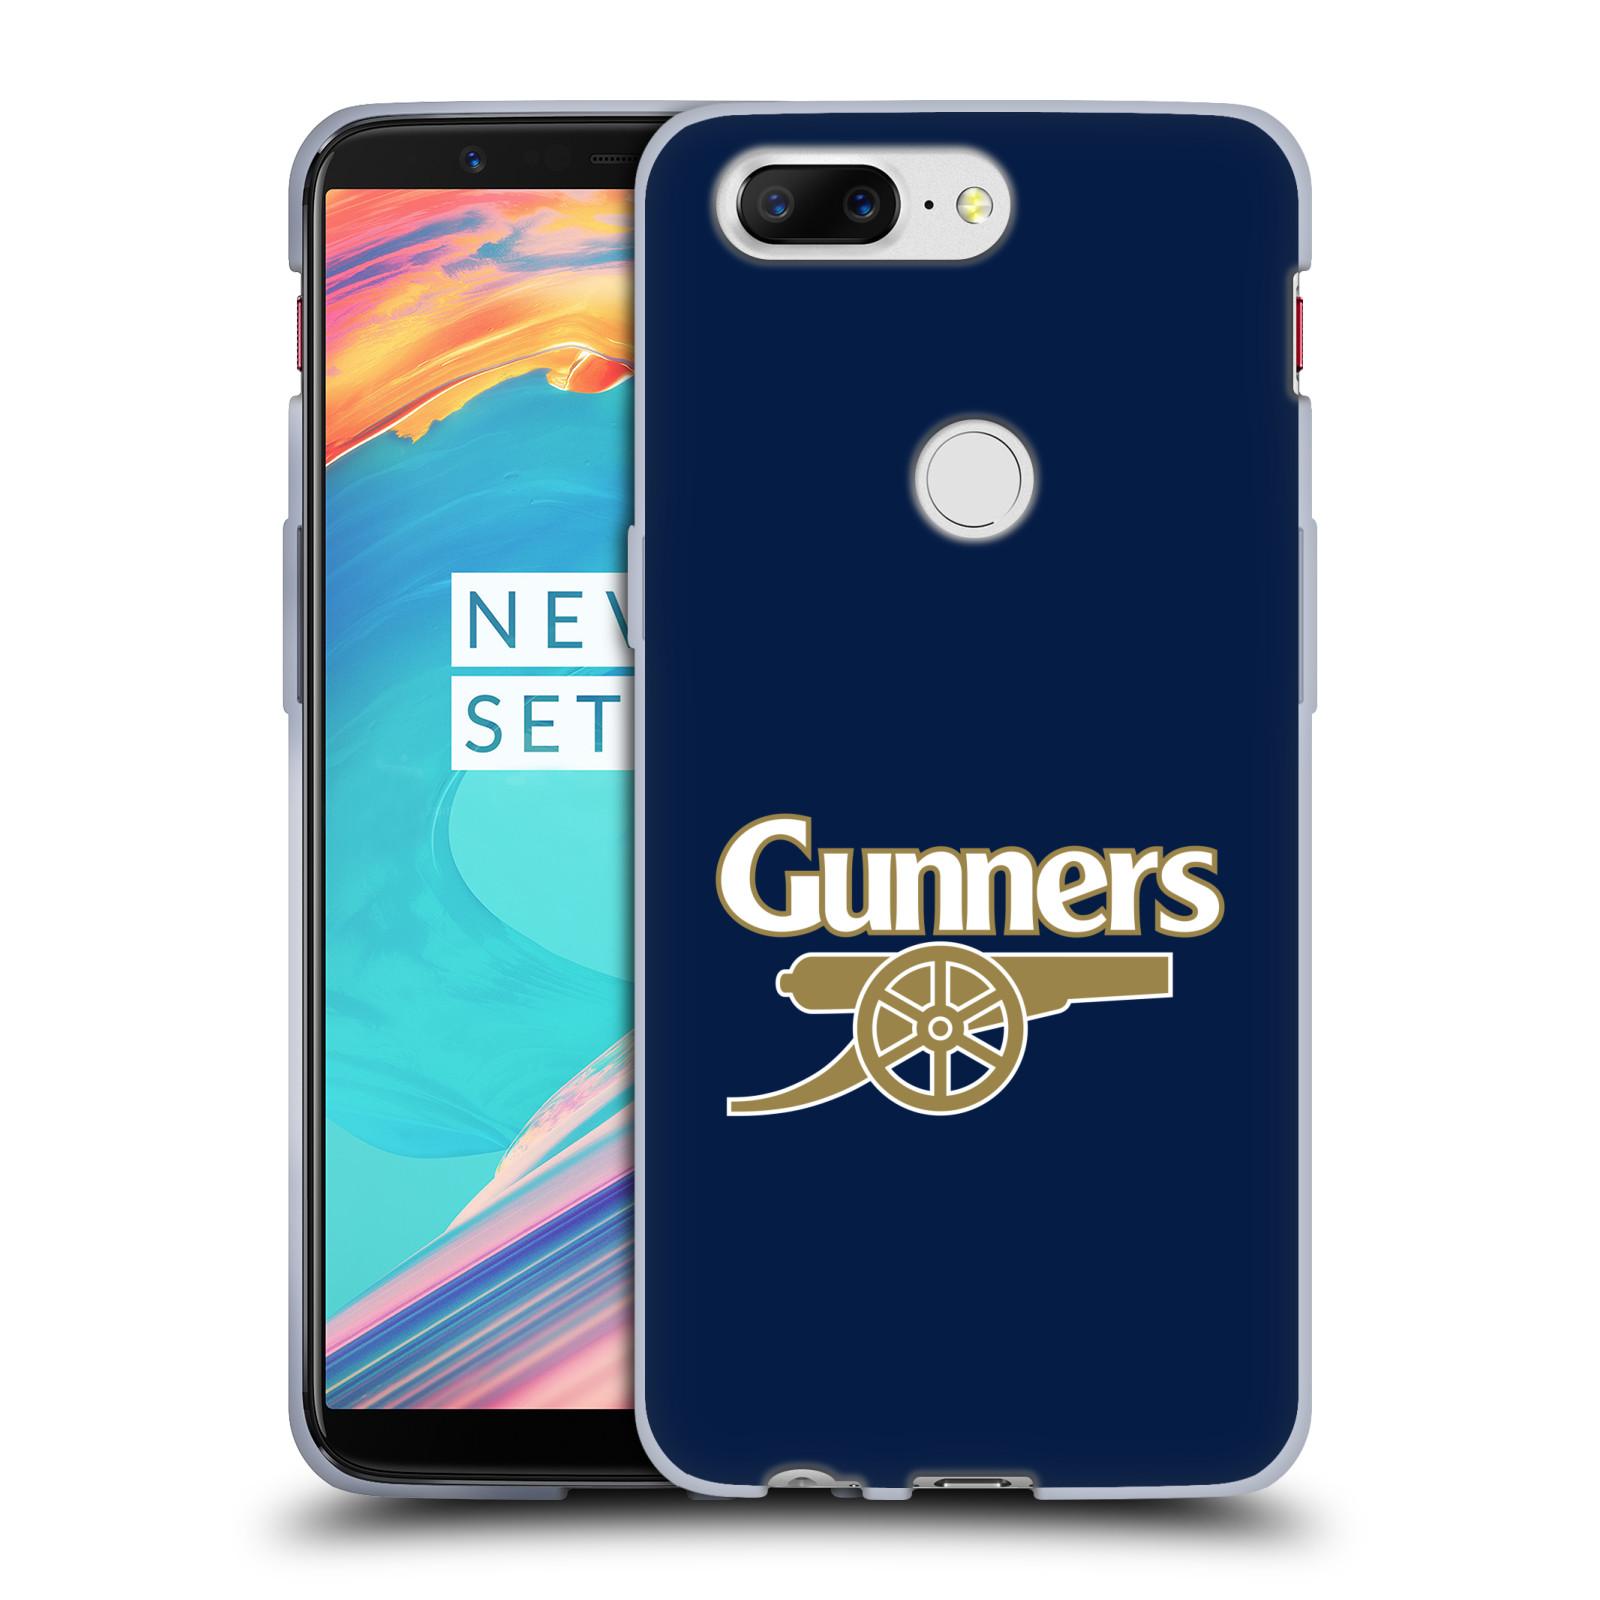 Silikonové pouzdro na mobil OnePlus 5T - Head Case - Arsenal FC - Gunners